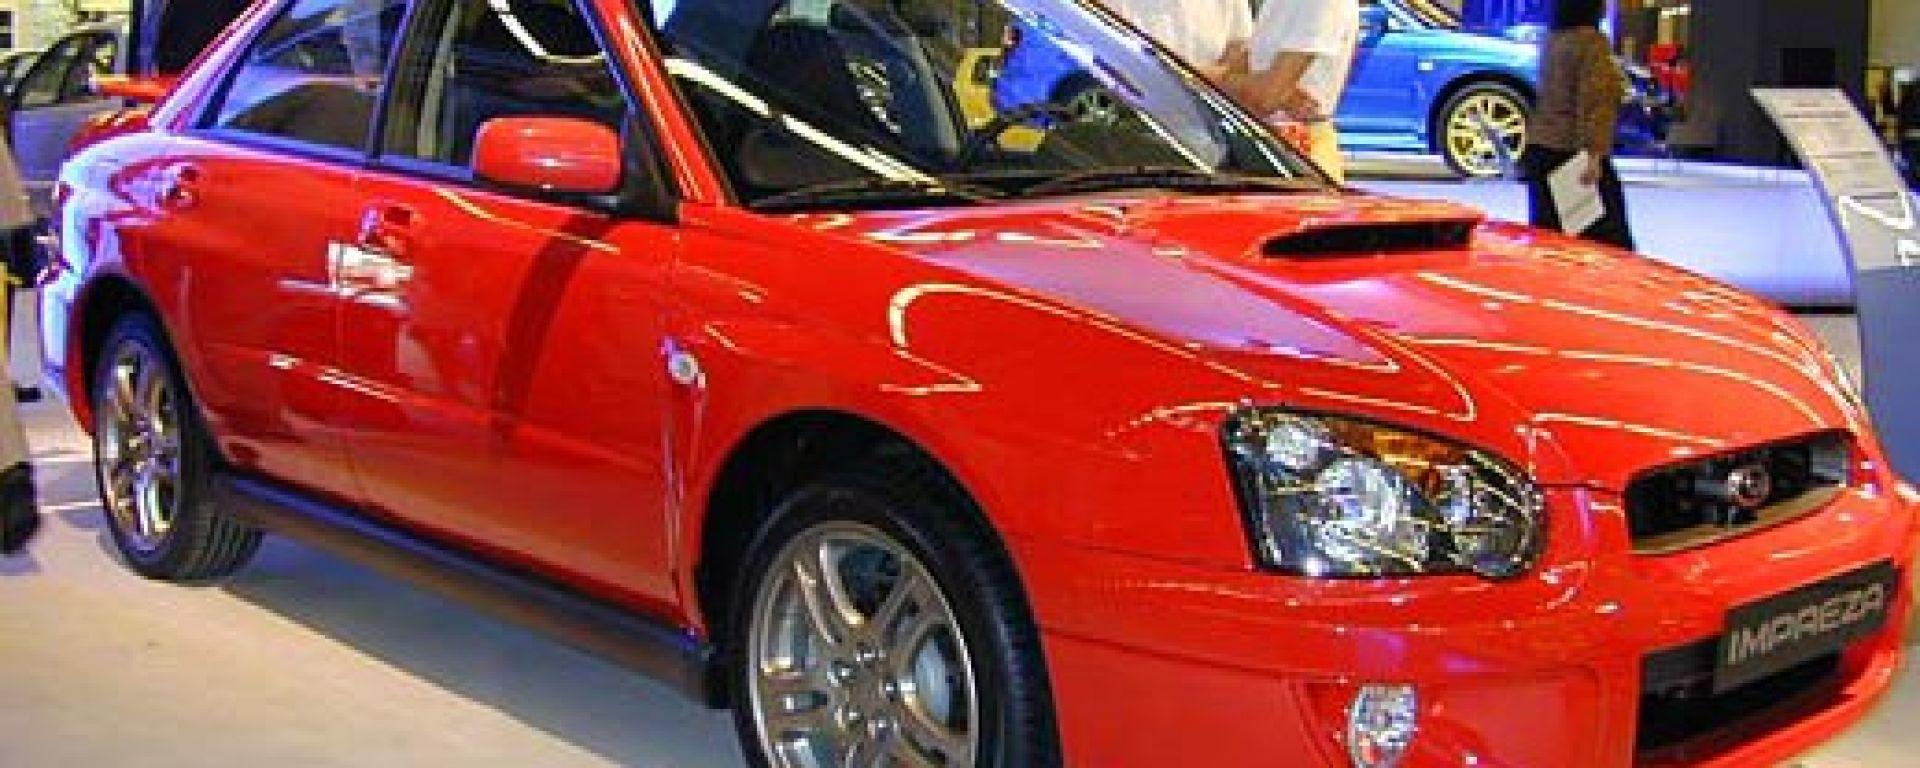 Subaru Impreza my 2003